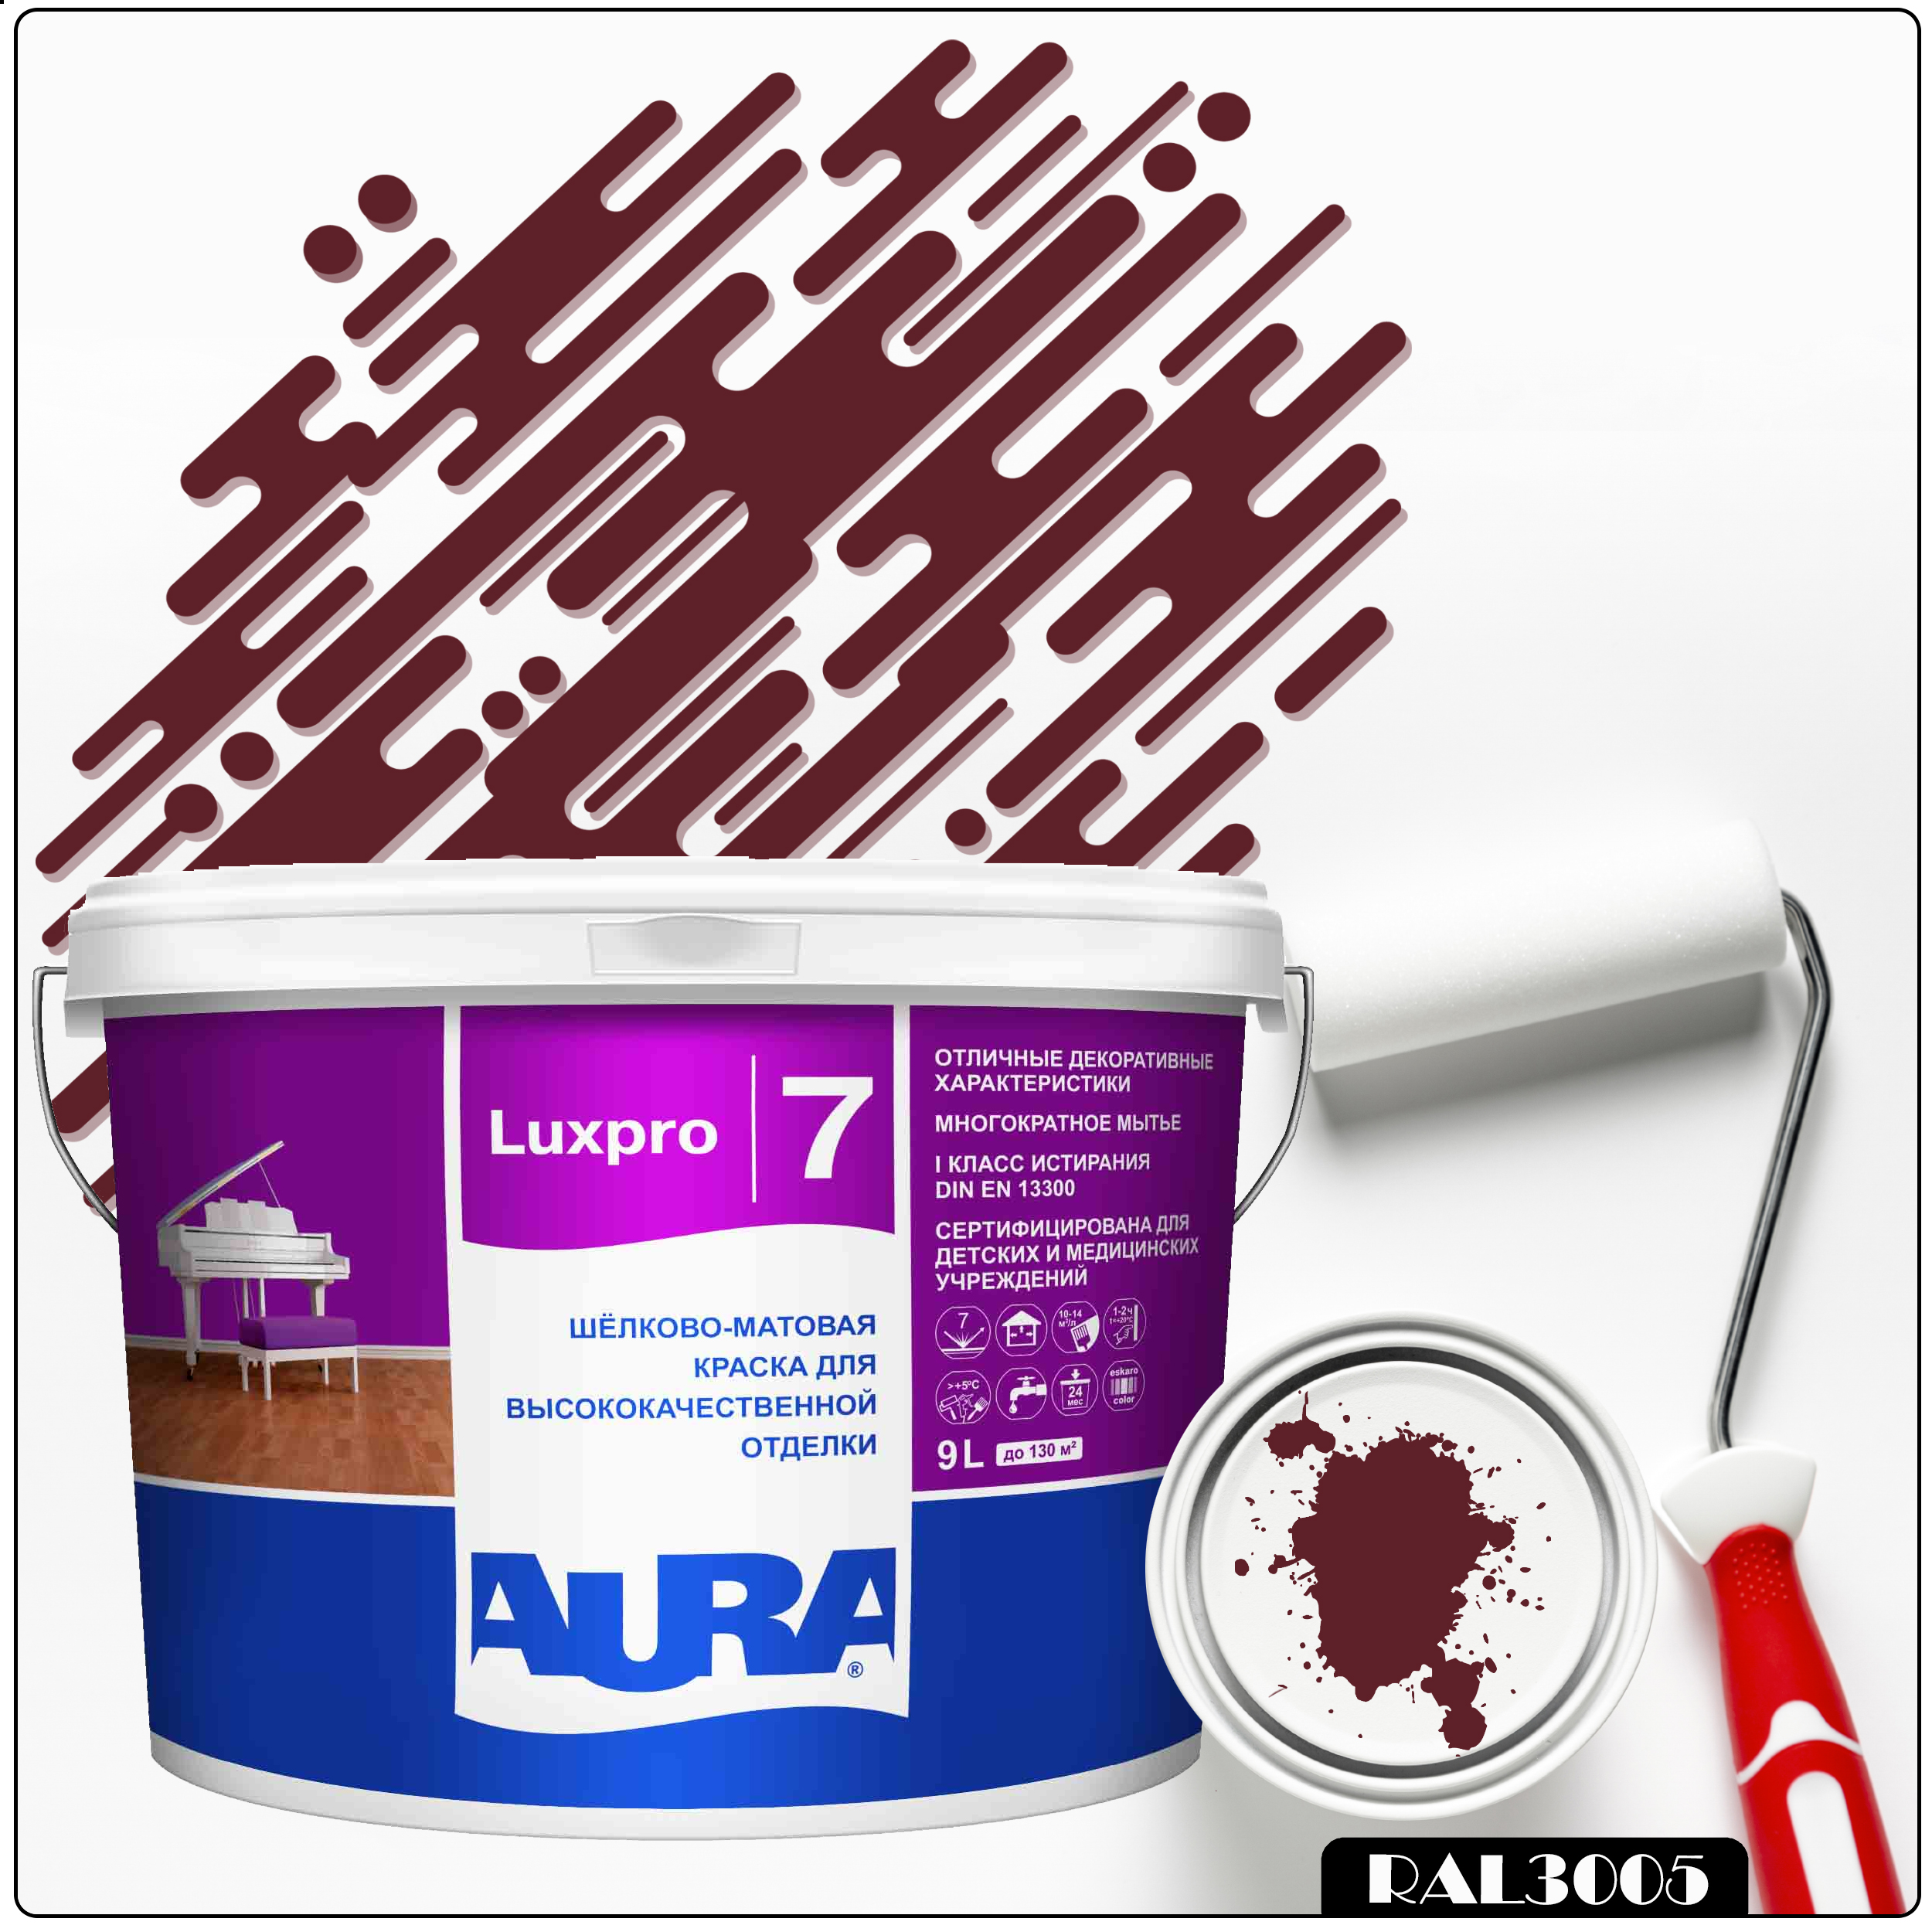 Фото 6 - Краска Aura LuxPRO 7, RAL 3005 Вишневый, латексная, шелково-матовая, интерьерная, 9л, Аура.